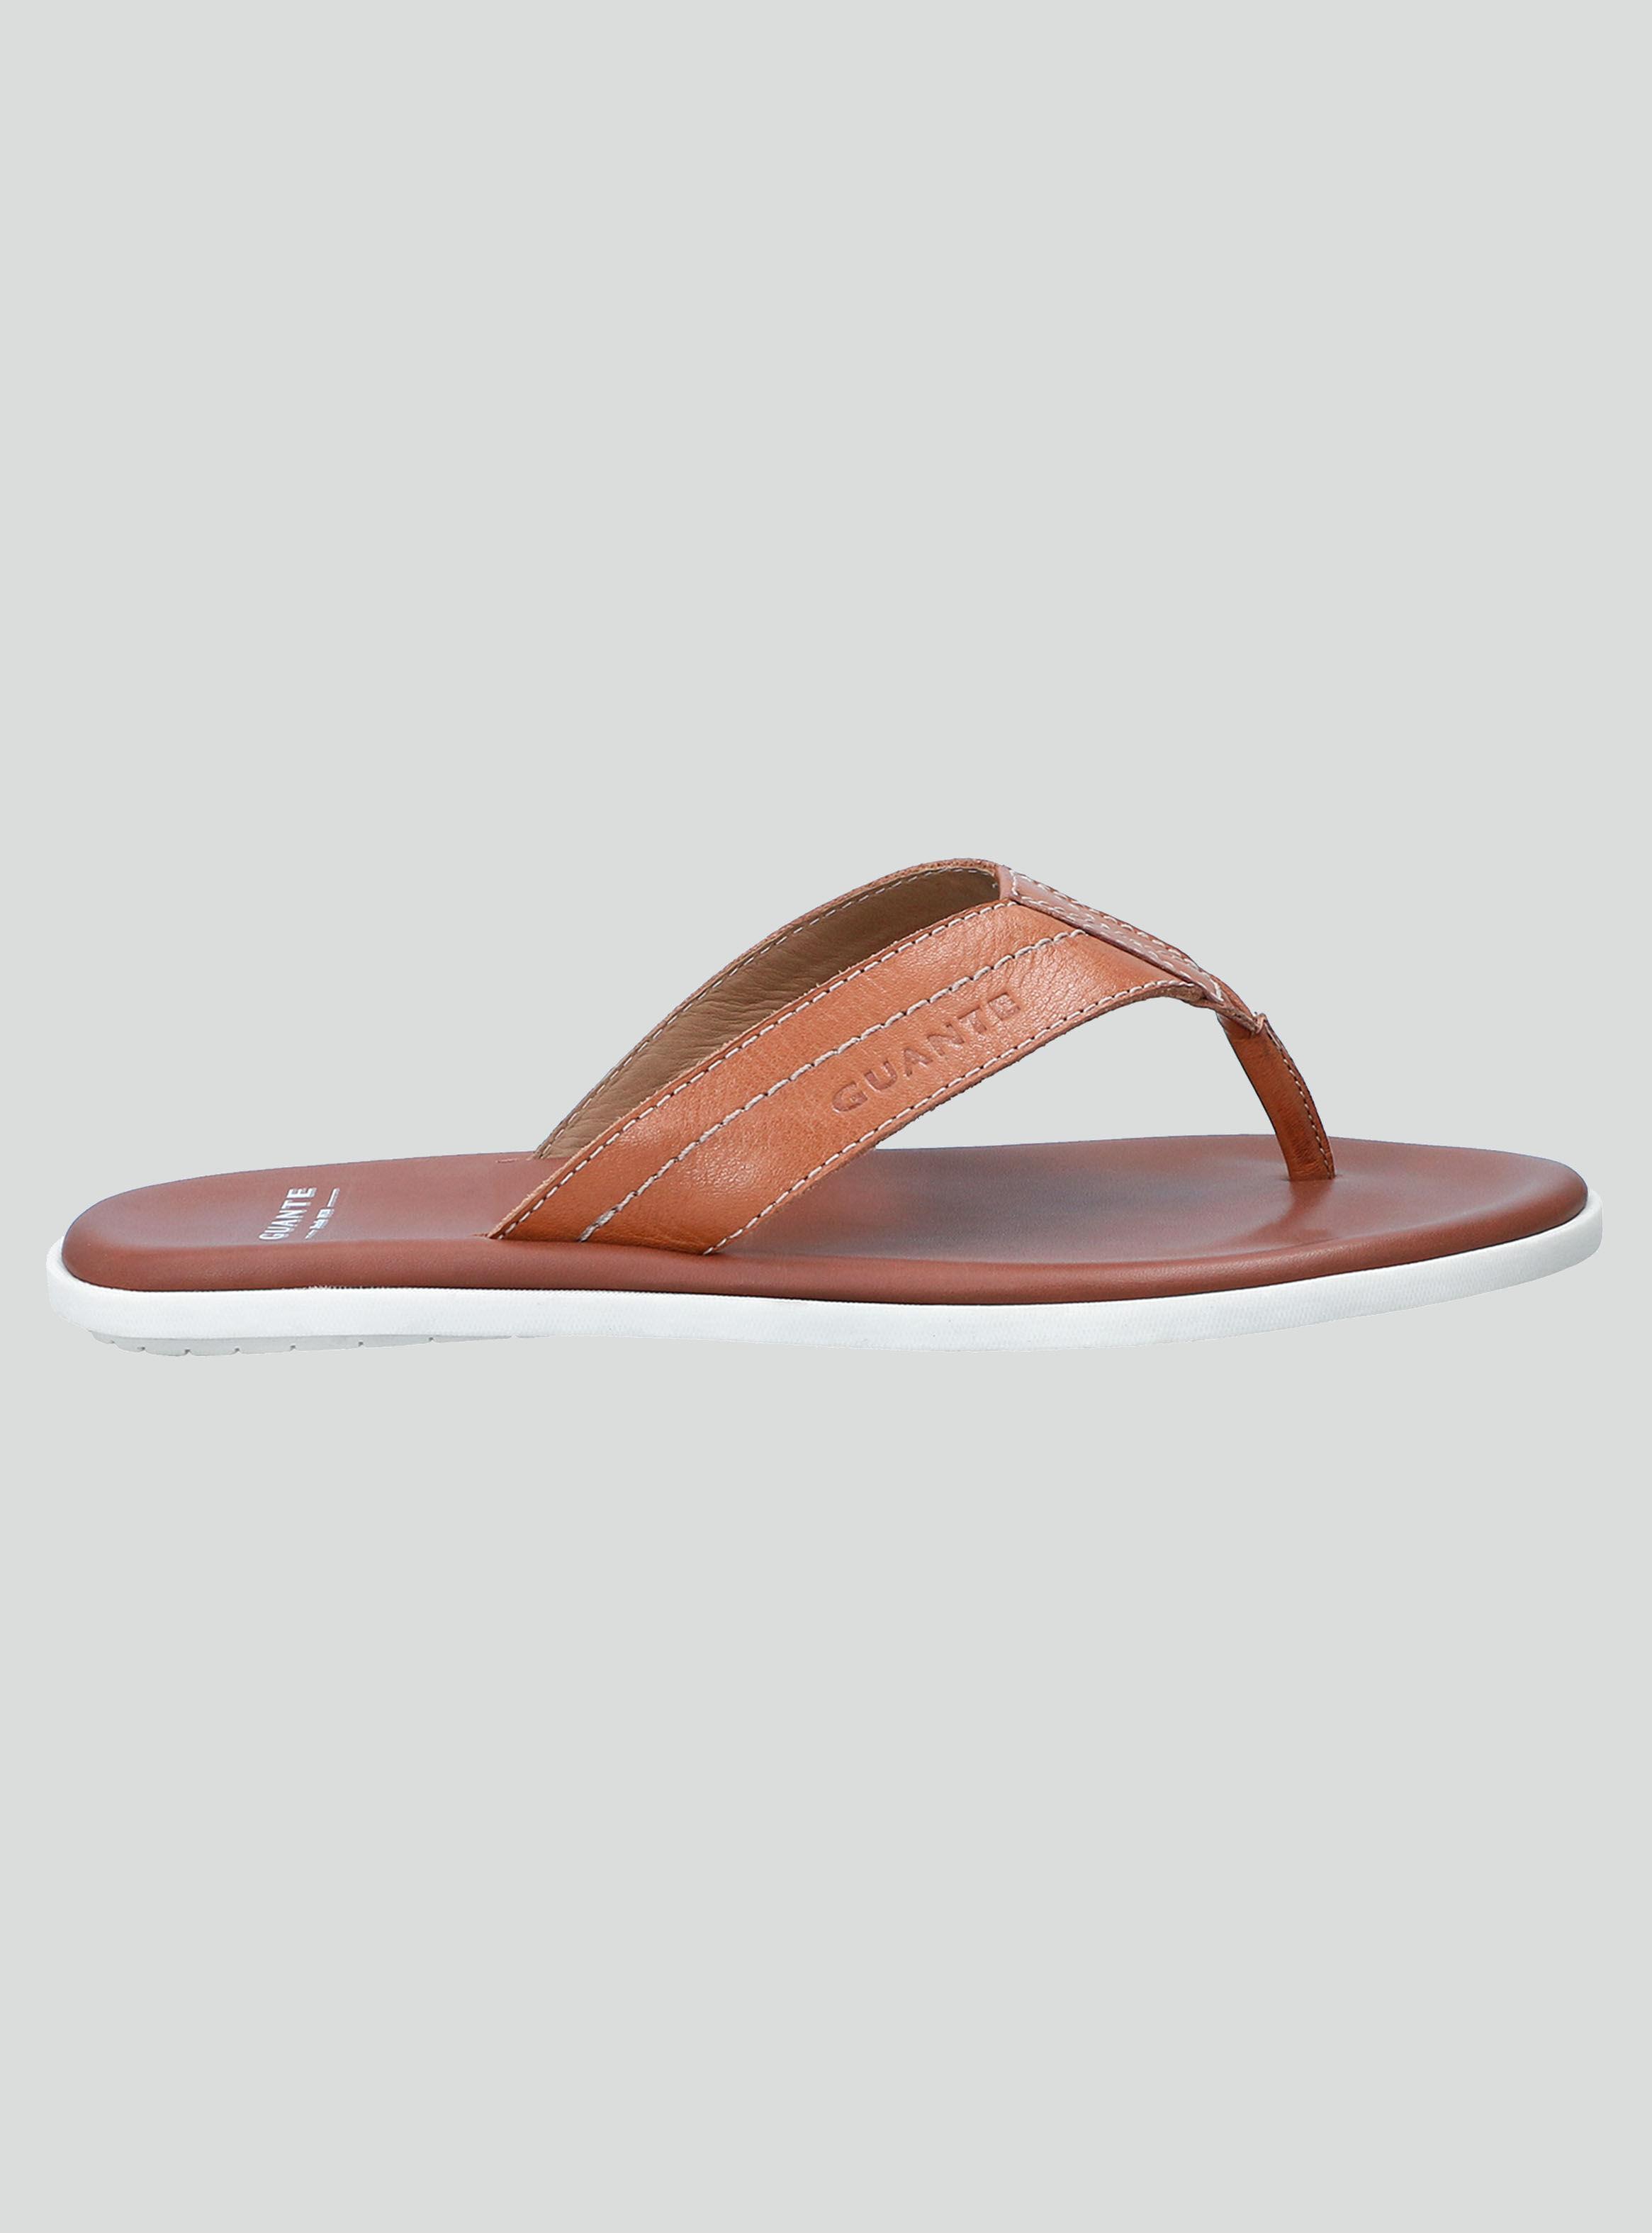 Los Sandalias Están Modelos cl ModaParis Que De T1KlFJc